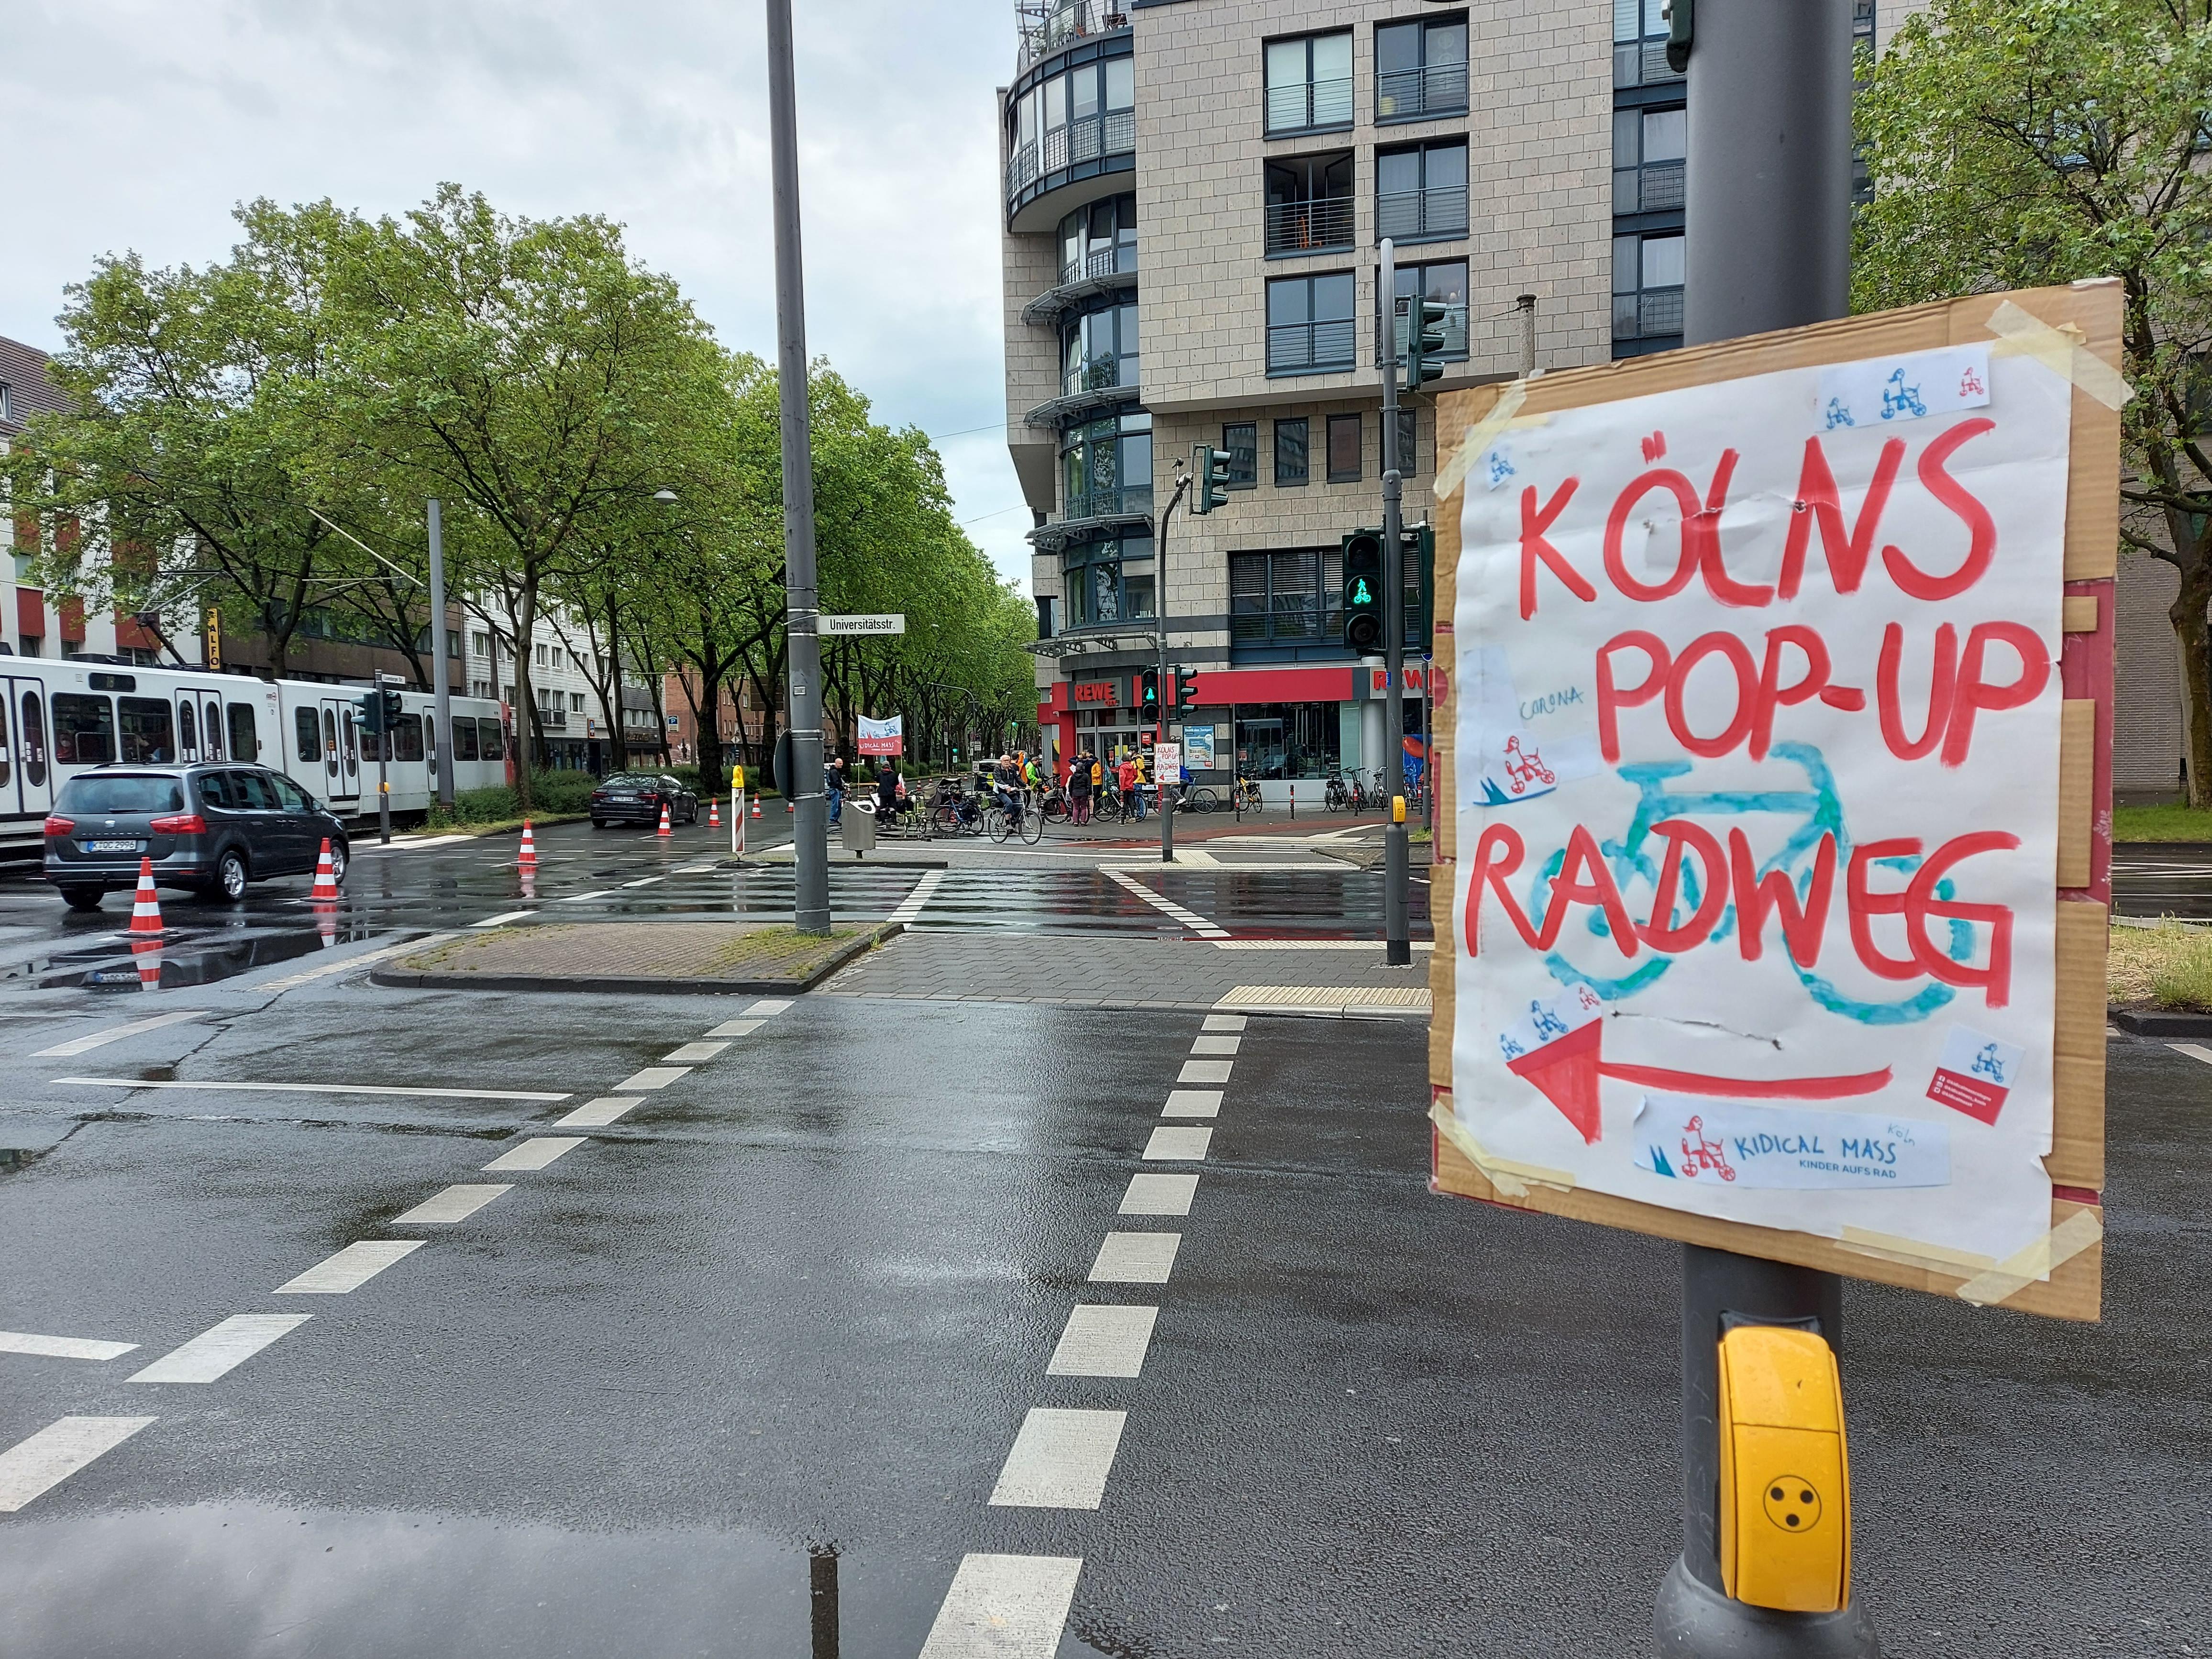 #gehzeug, #greenpeace, #weltfahrradtag, #worldbicycleday, #popupbikelane, #köln, #luxemburgerstraße, #bauhof,